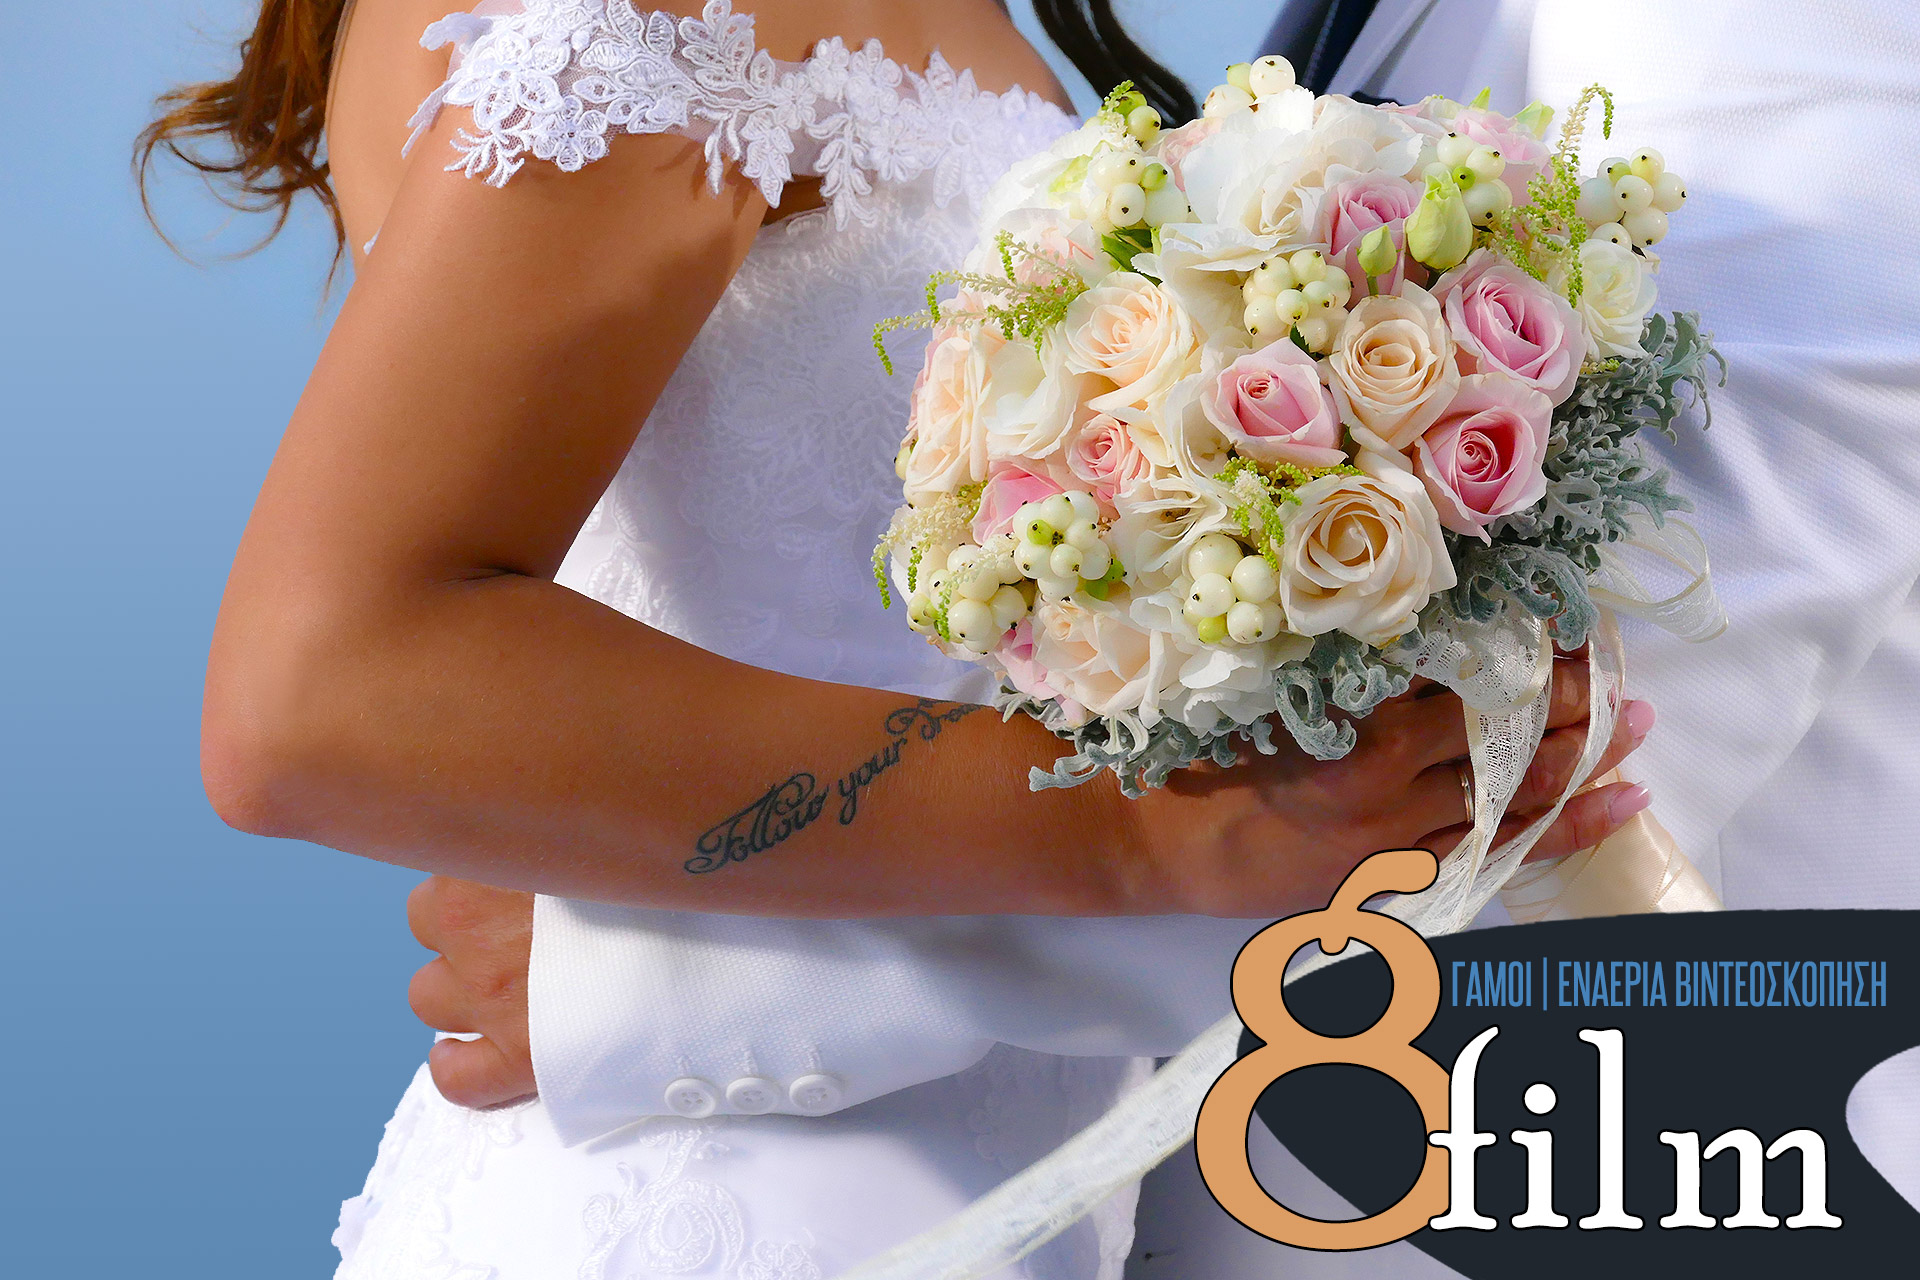 GAMOS-DRONE-WEDDING-GIATRAKOS-8FILM